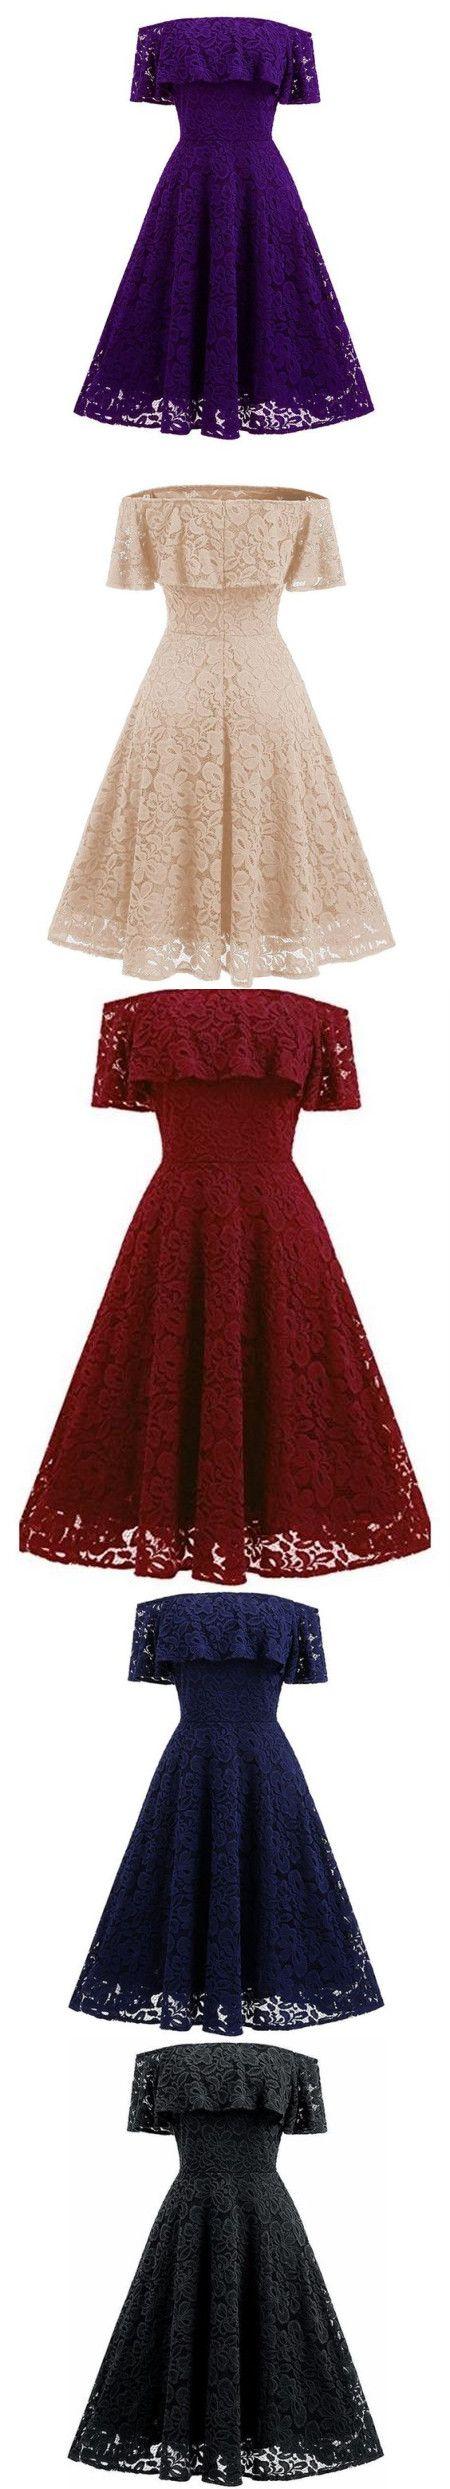 Aline long sleeve offtheshoulder grace homecoming dresses asd